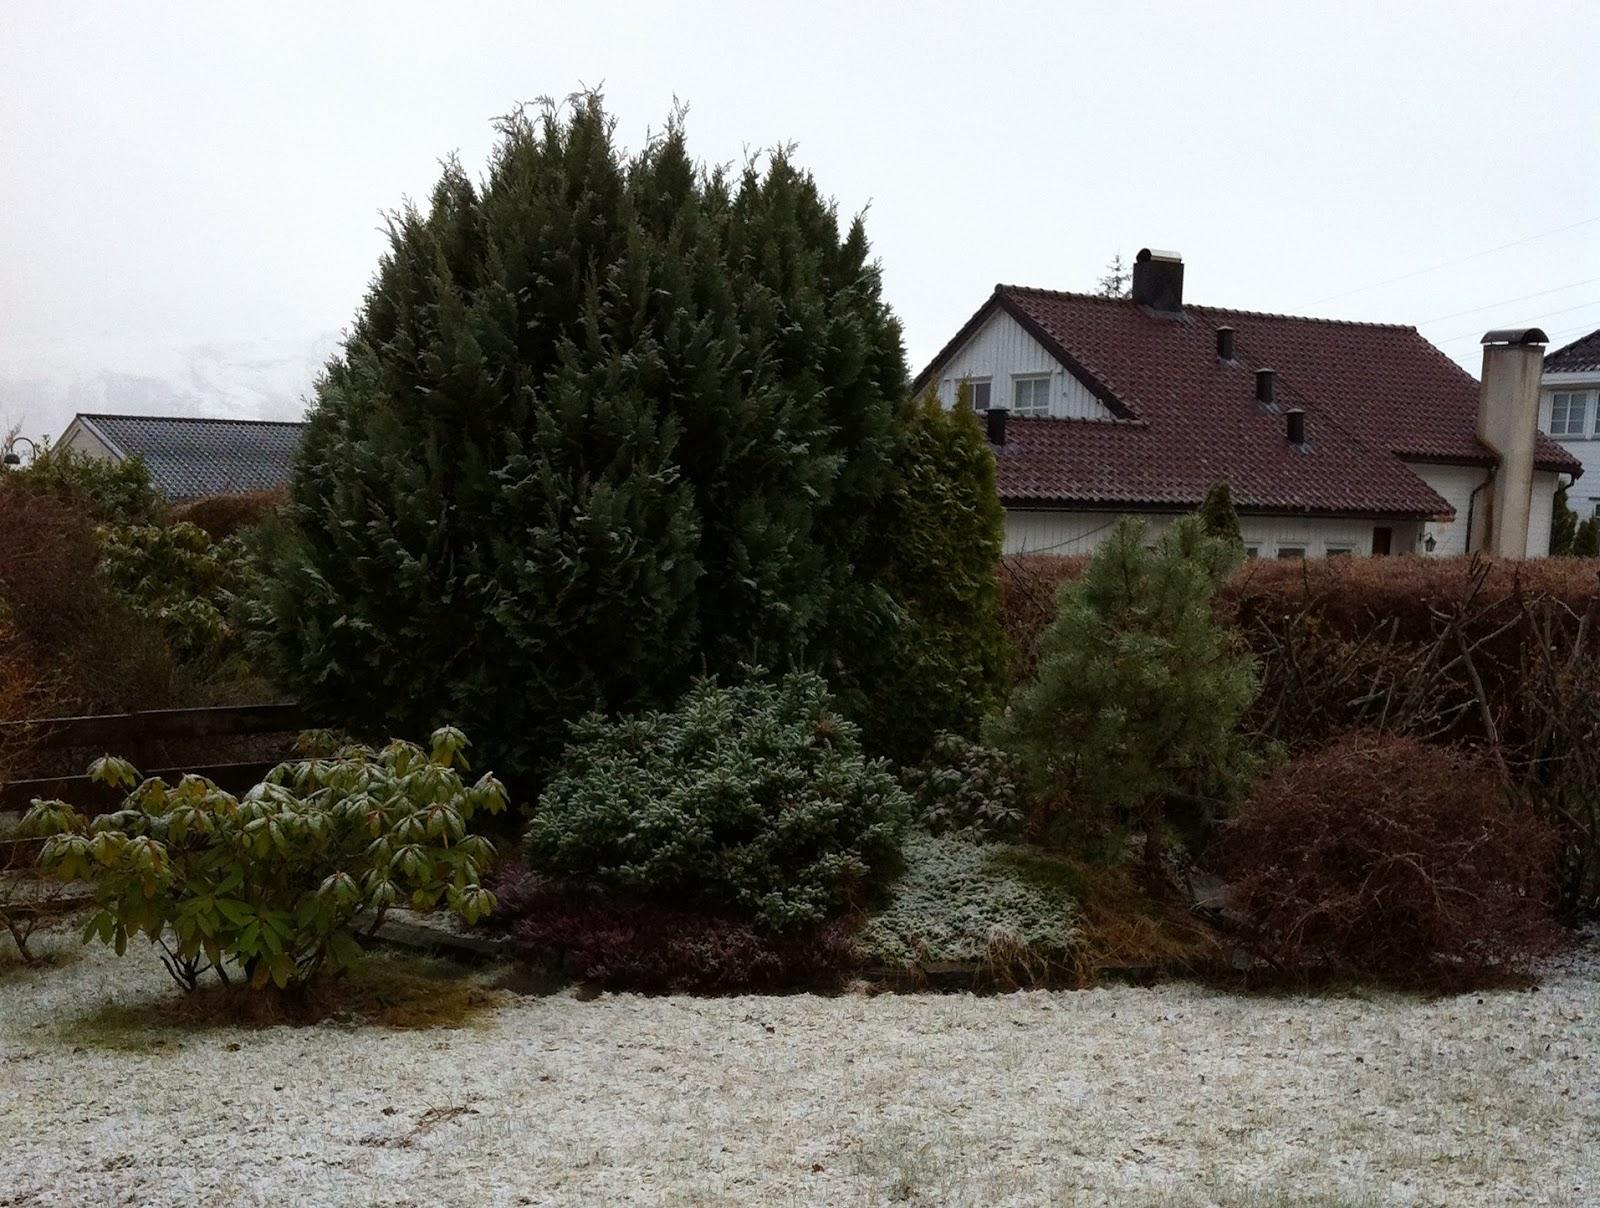 Liv og Gus i hytte og hus: Vintergrønne busker og trær